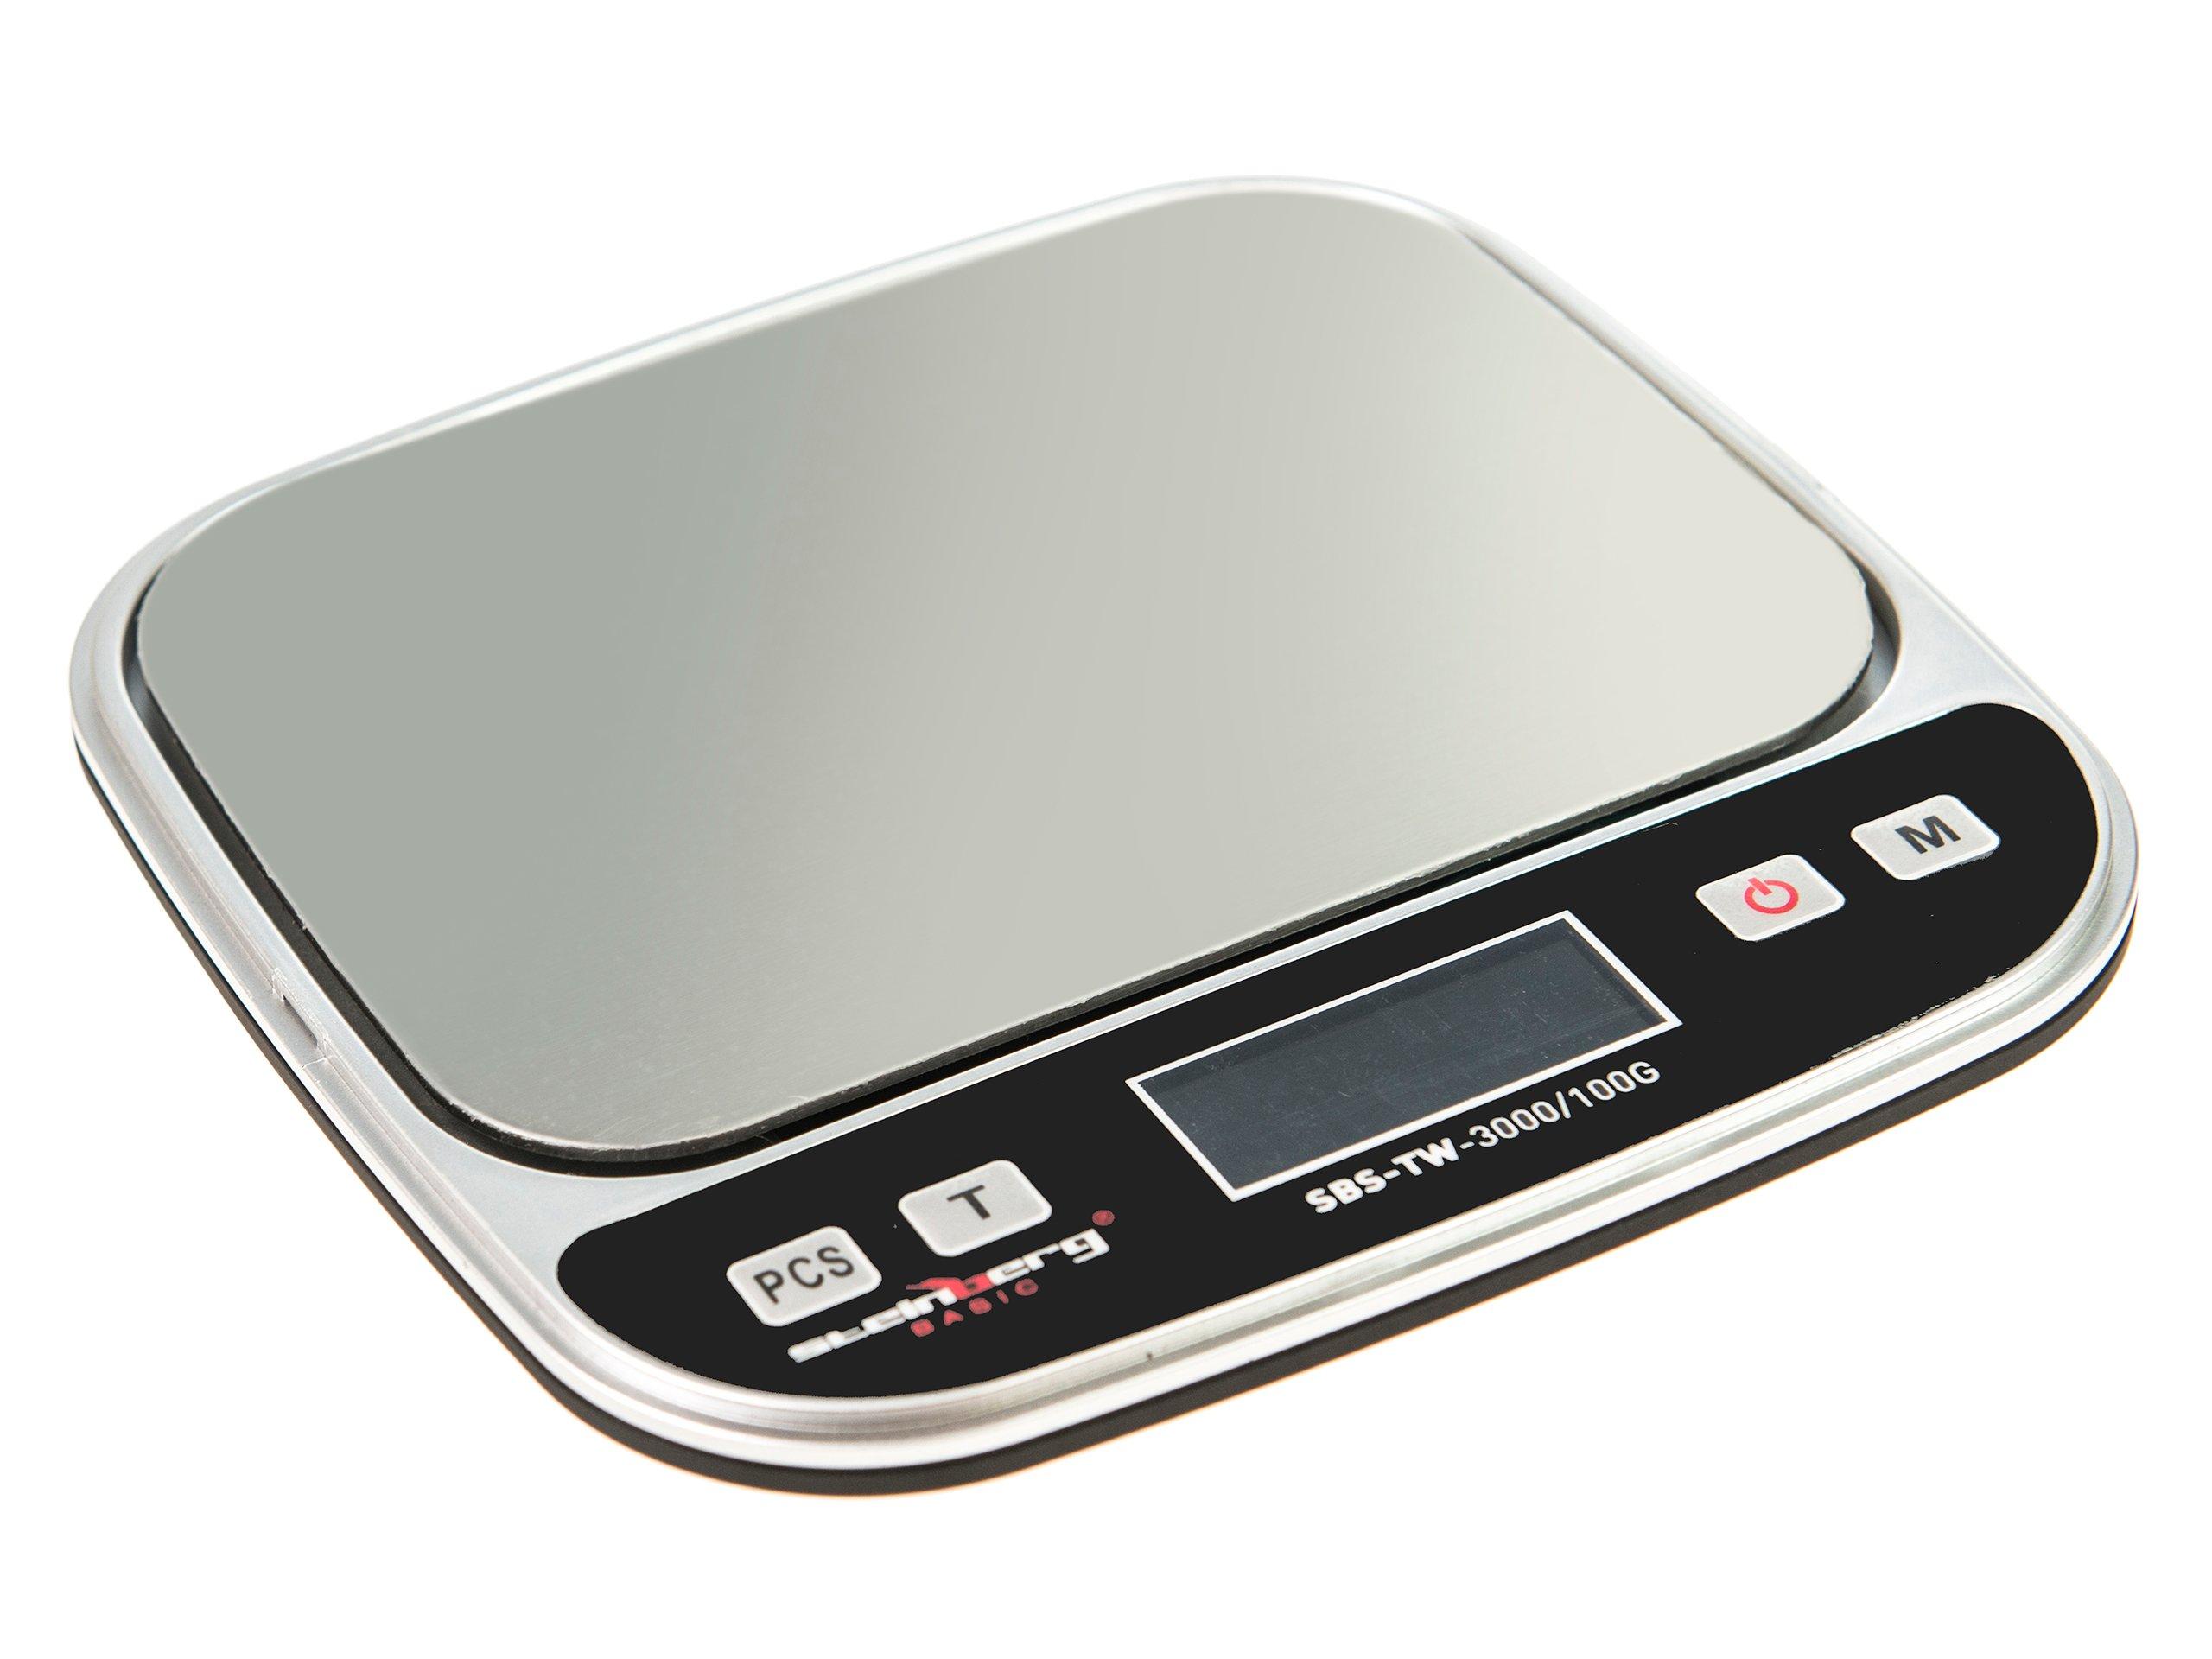 Waga Dokladna Kuchenna Spozywcza 0 5kg 0 01g Liczy 6730260697 Allegro Pl